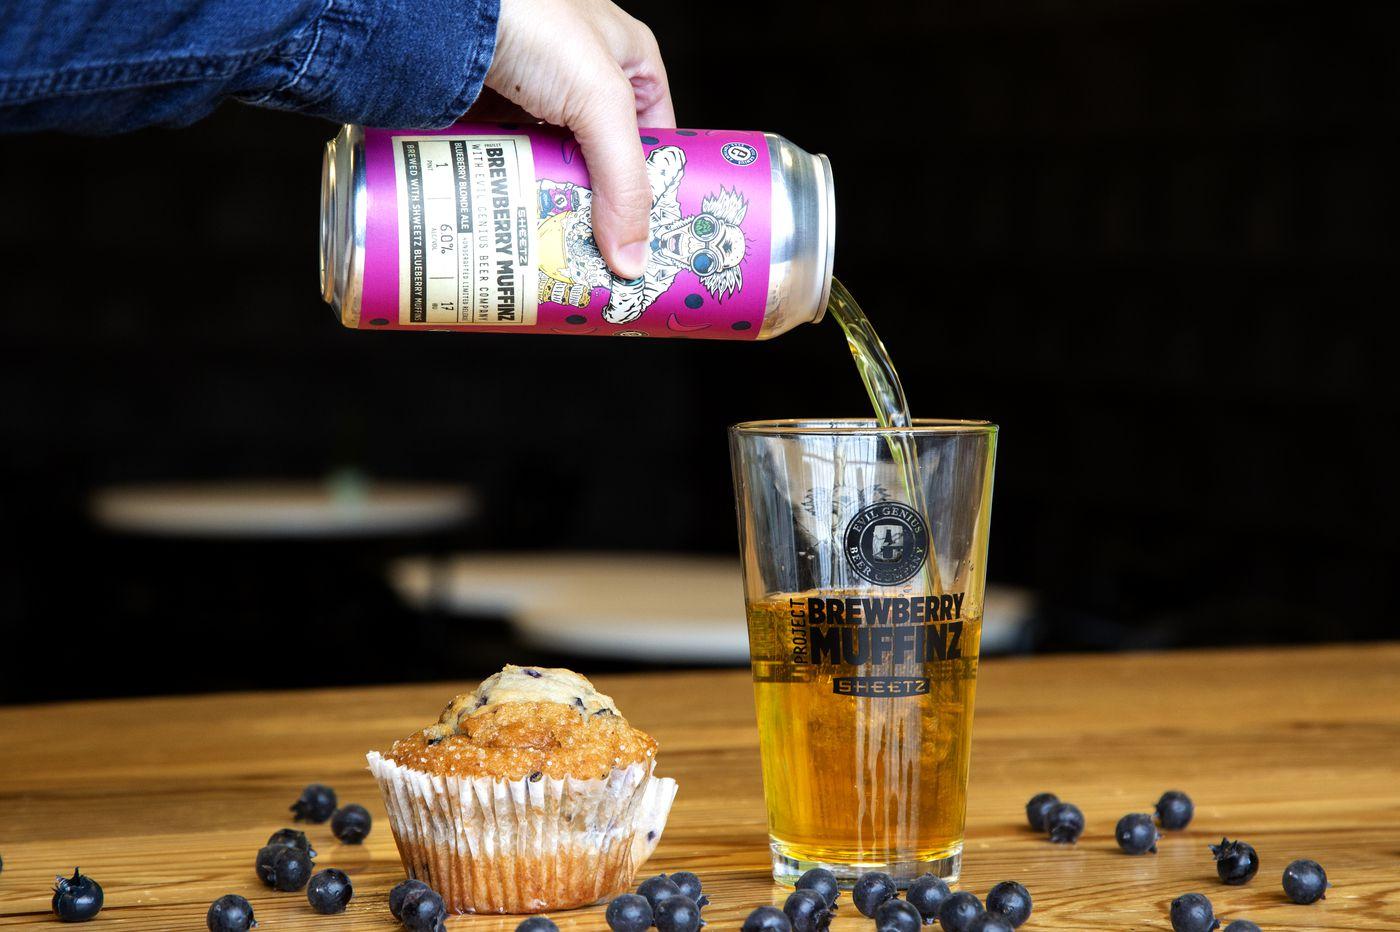 Sheetz Enters Wawa Territory With Philadelphia Breakfast Beer Partnership